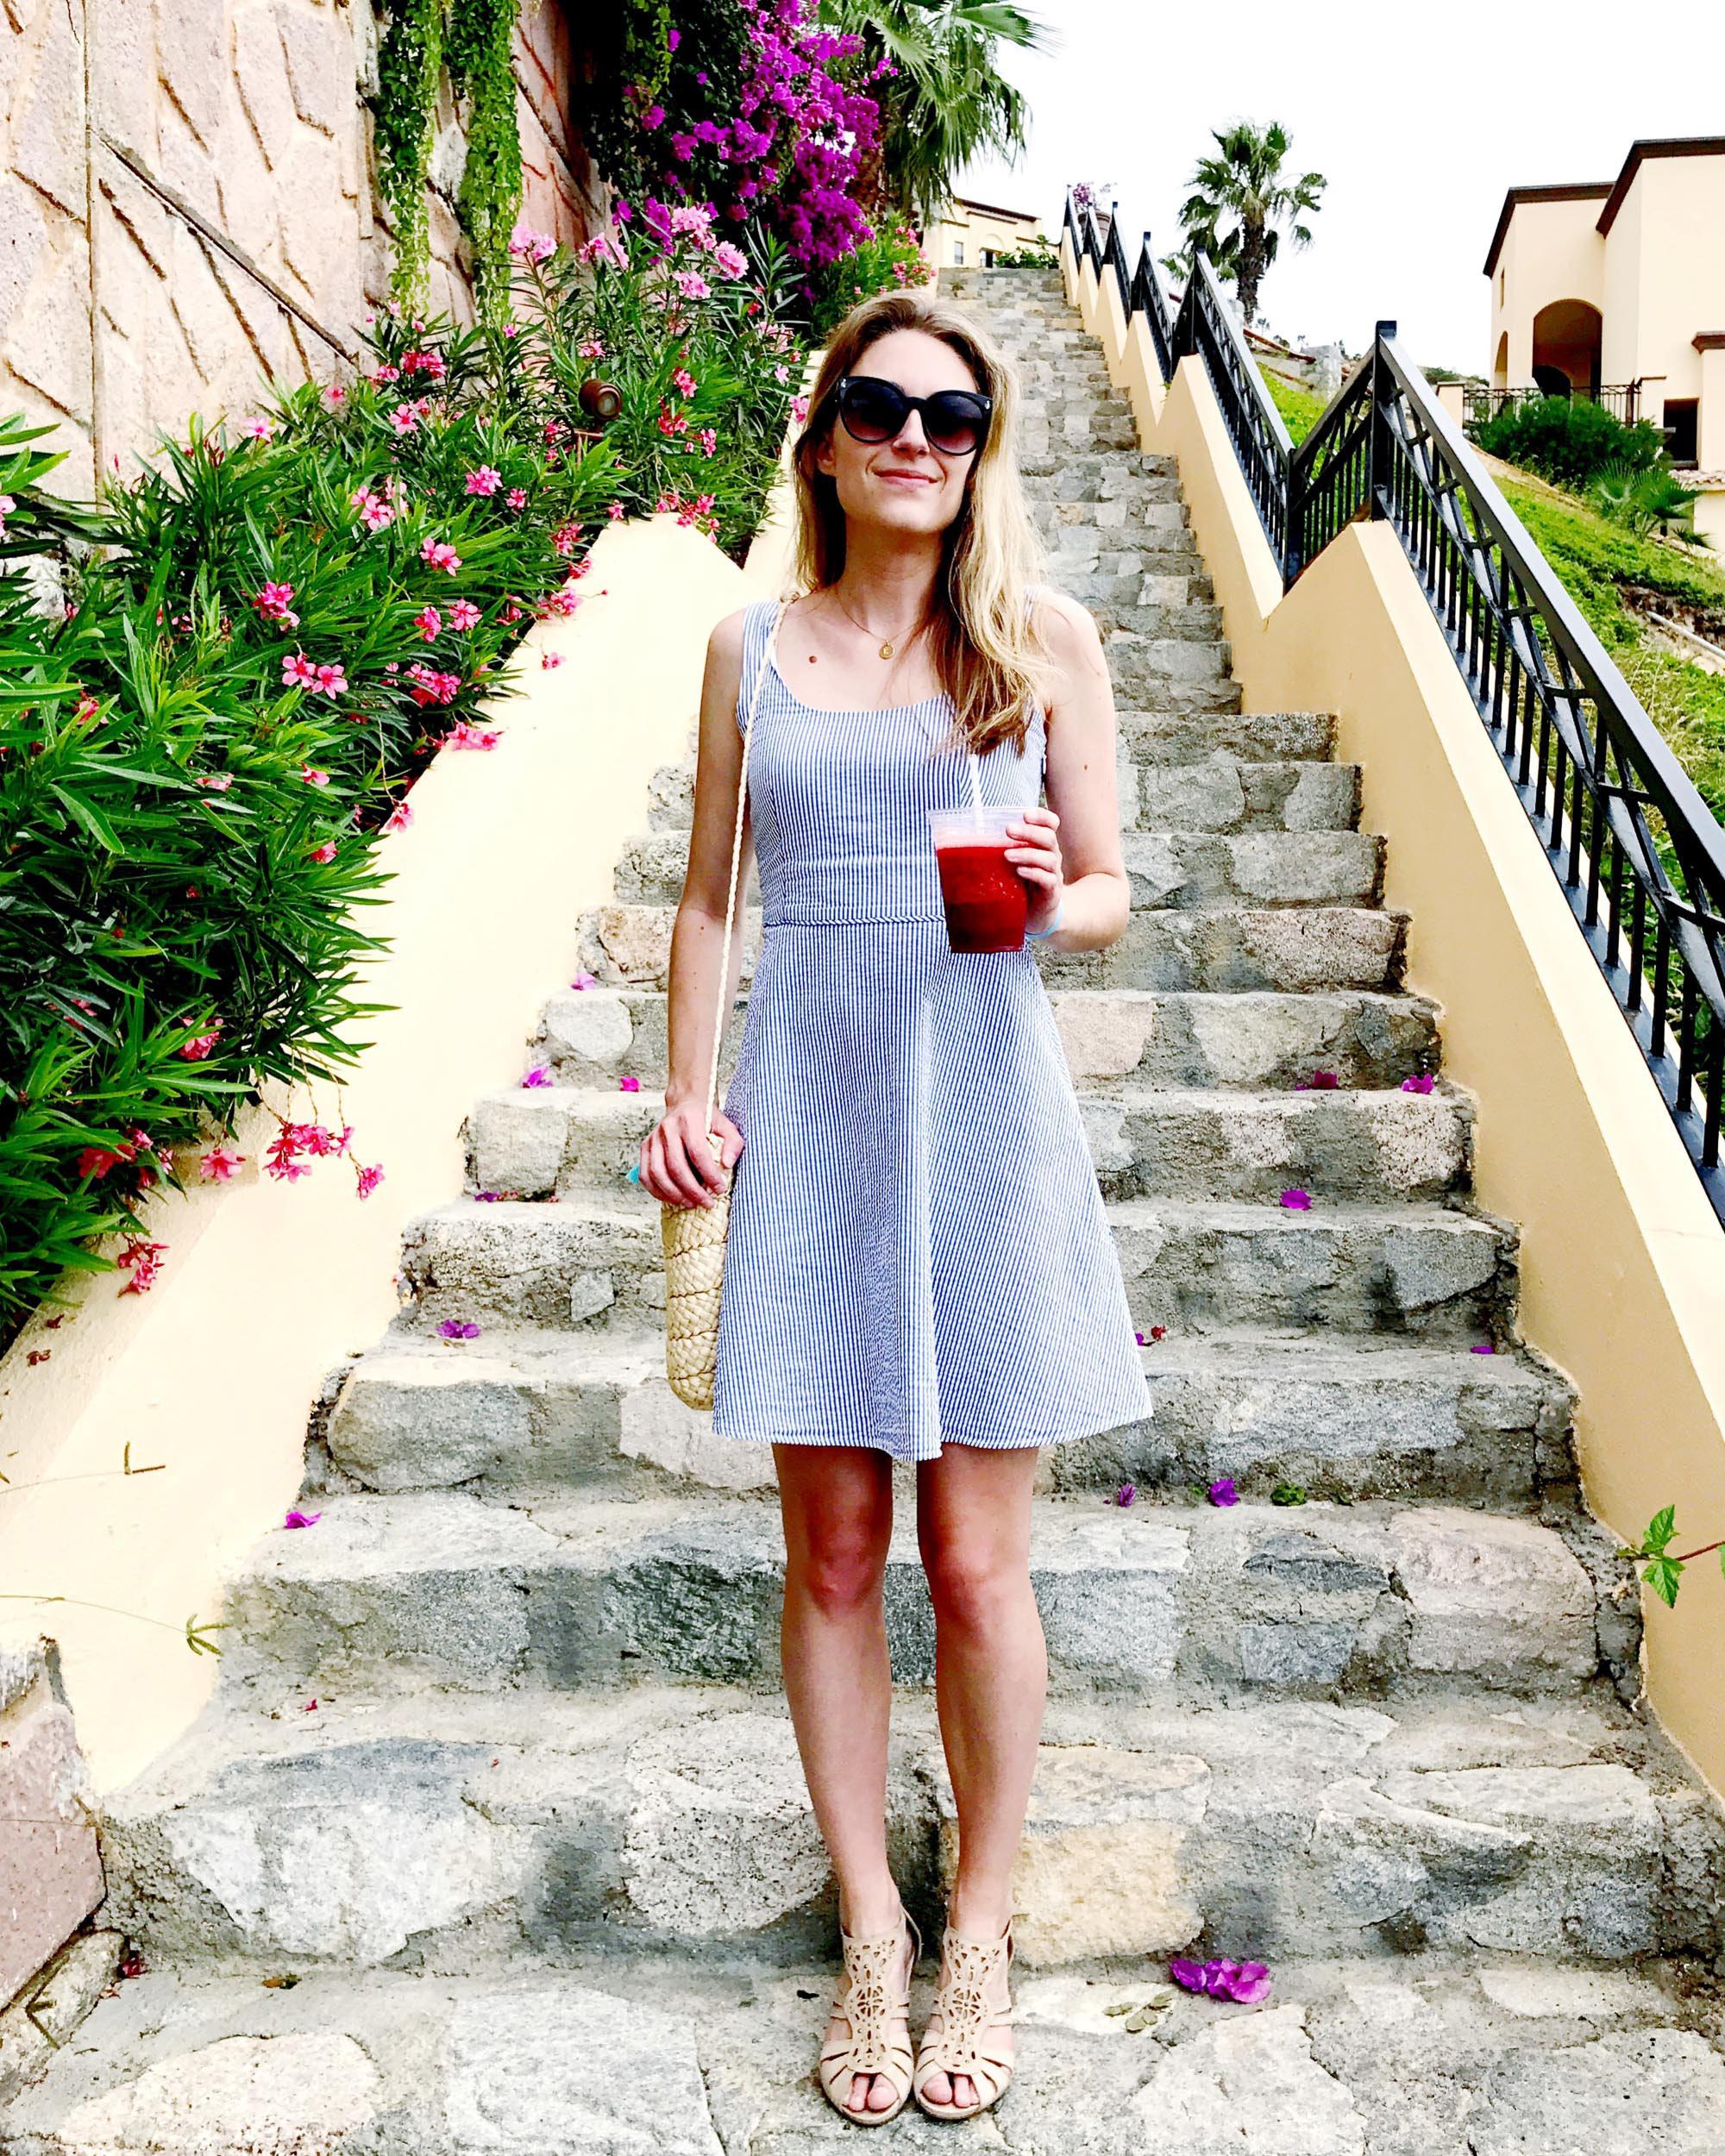 Seersucker sun dress outfit in Cabo San Lucas, Mexico — Cotton Cashmere Cat Hair